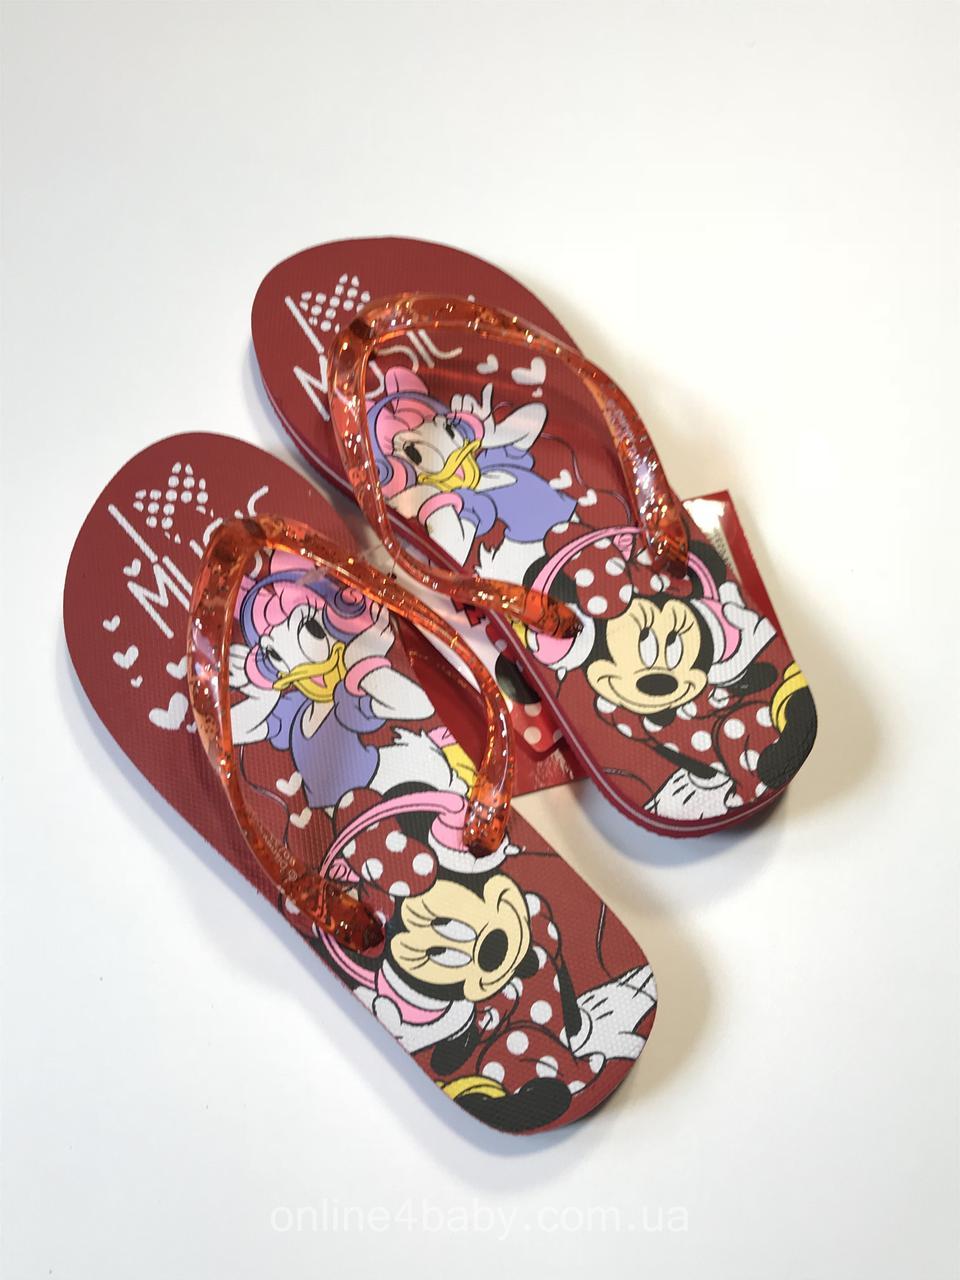 4485e83b3 Детские шлёпанцы, вьетнамки Disney на девочку, размер 30/31: продажа ...